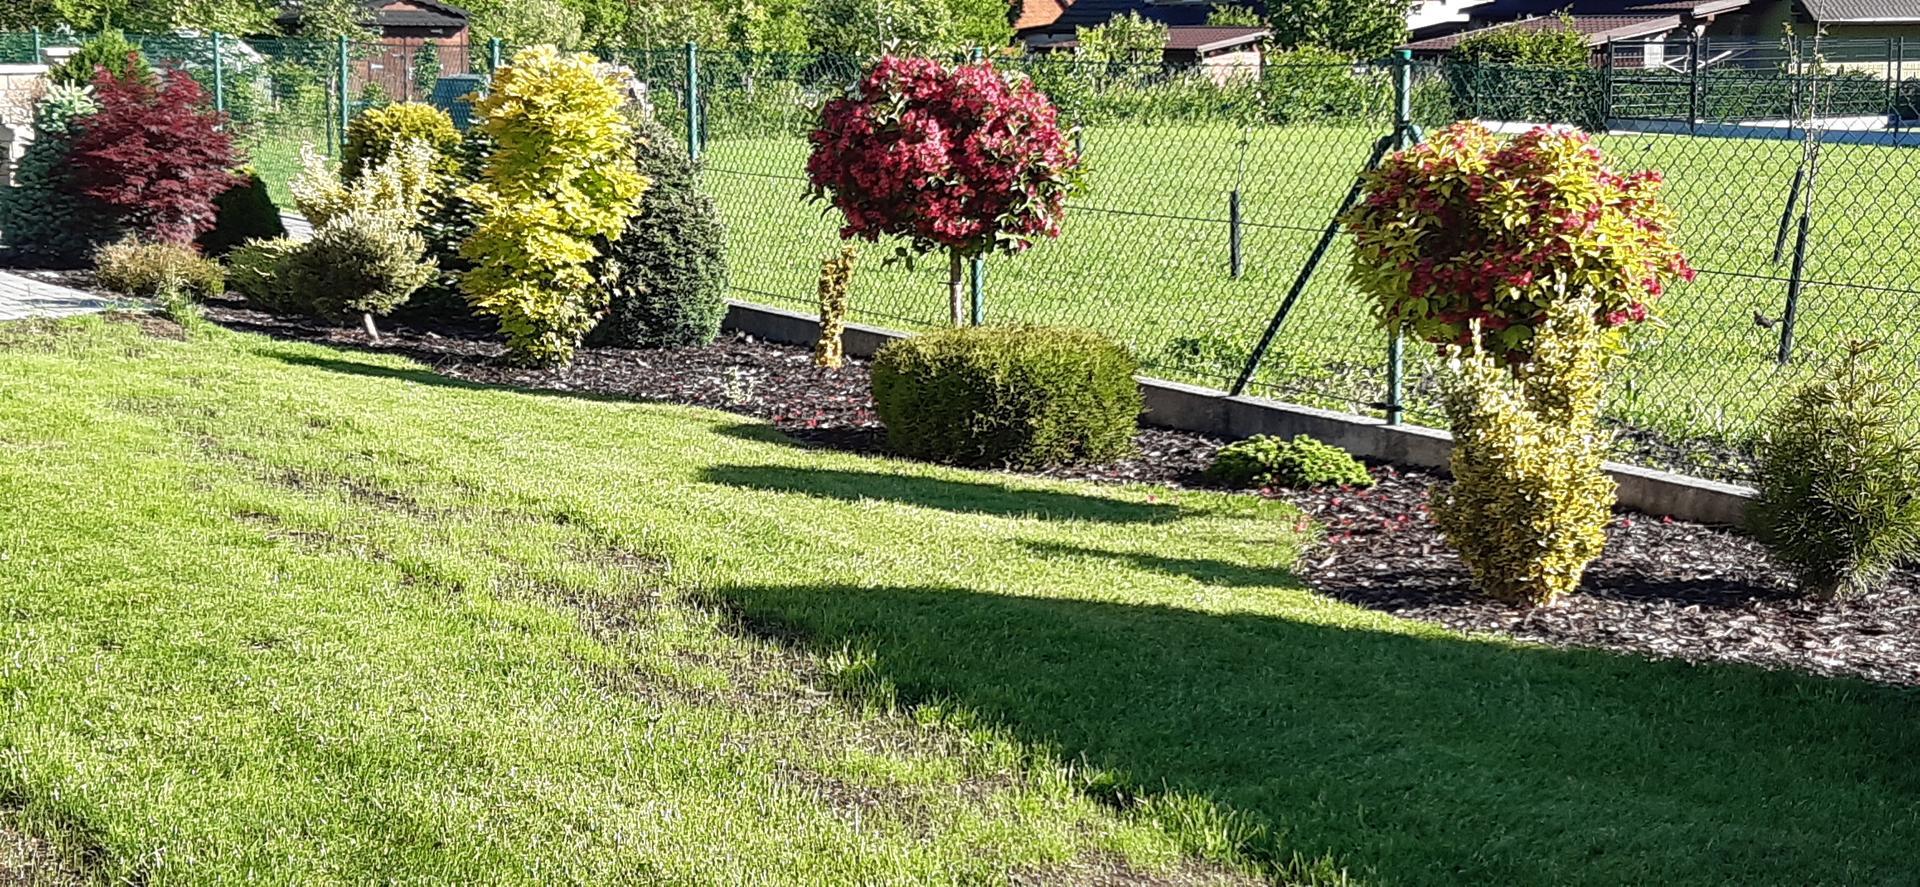 Zahrada 2020 - Obrázek č. 24